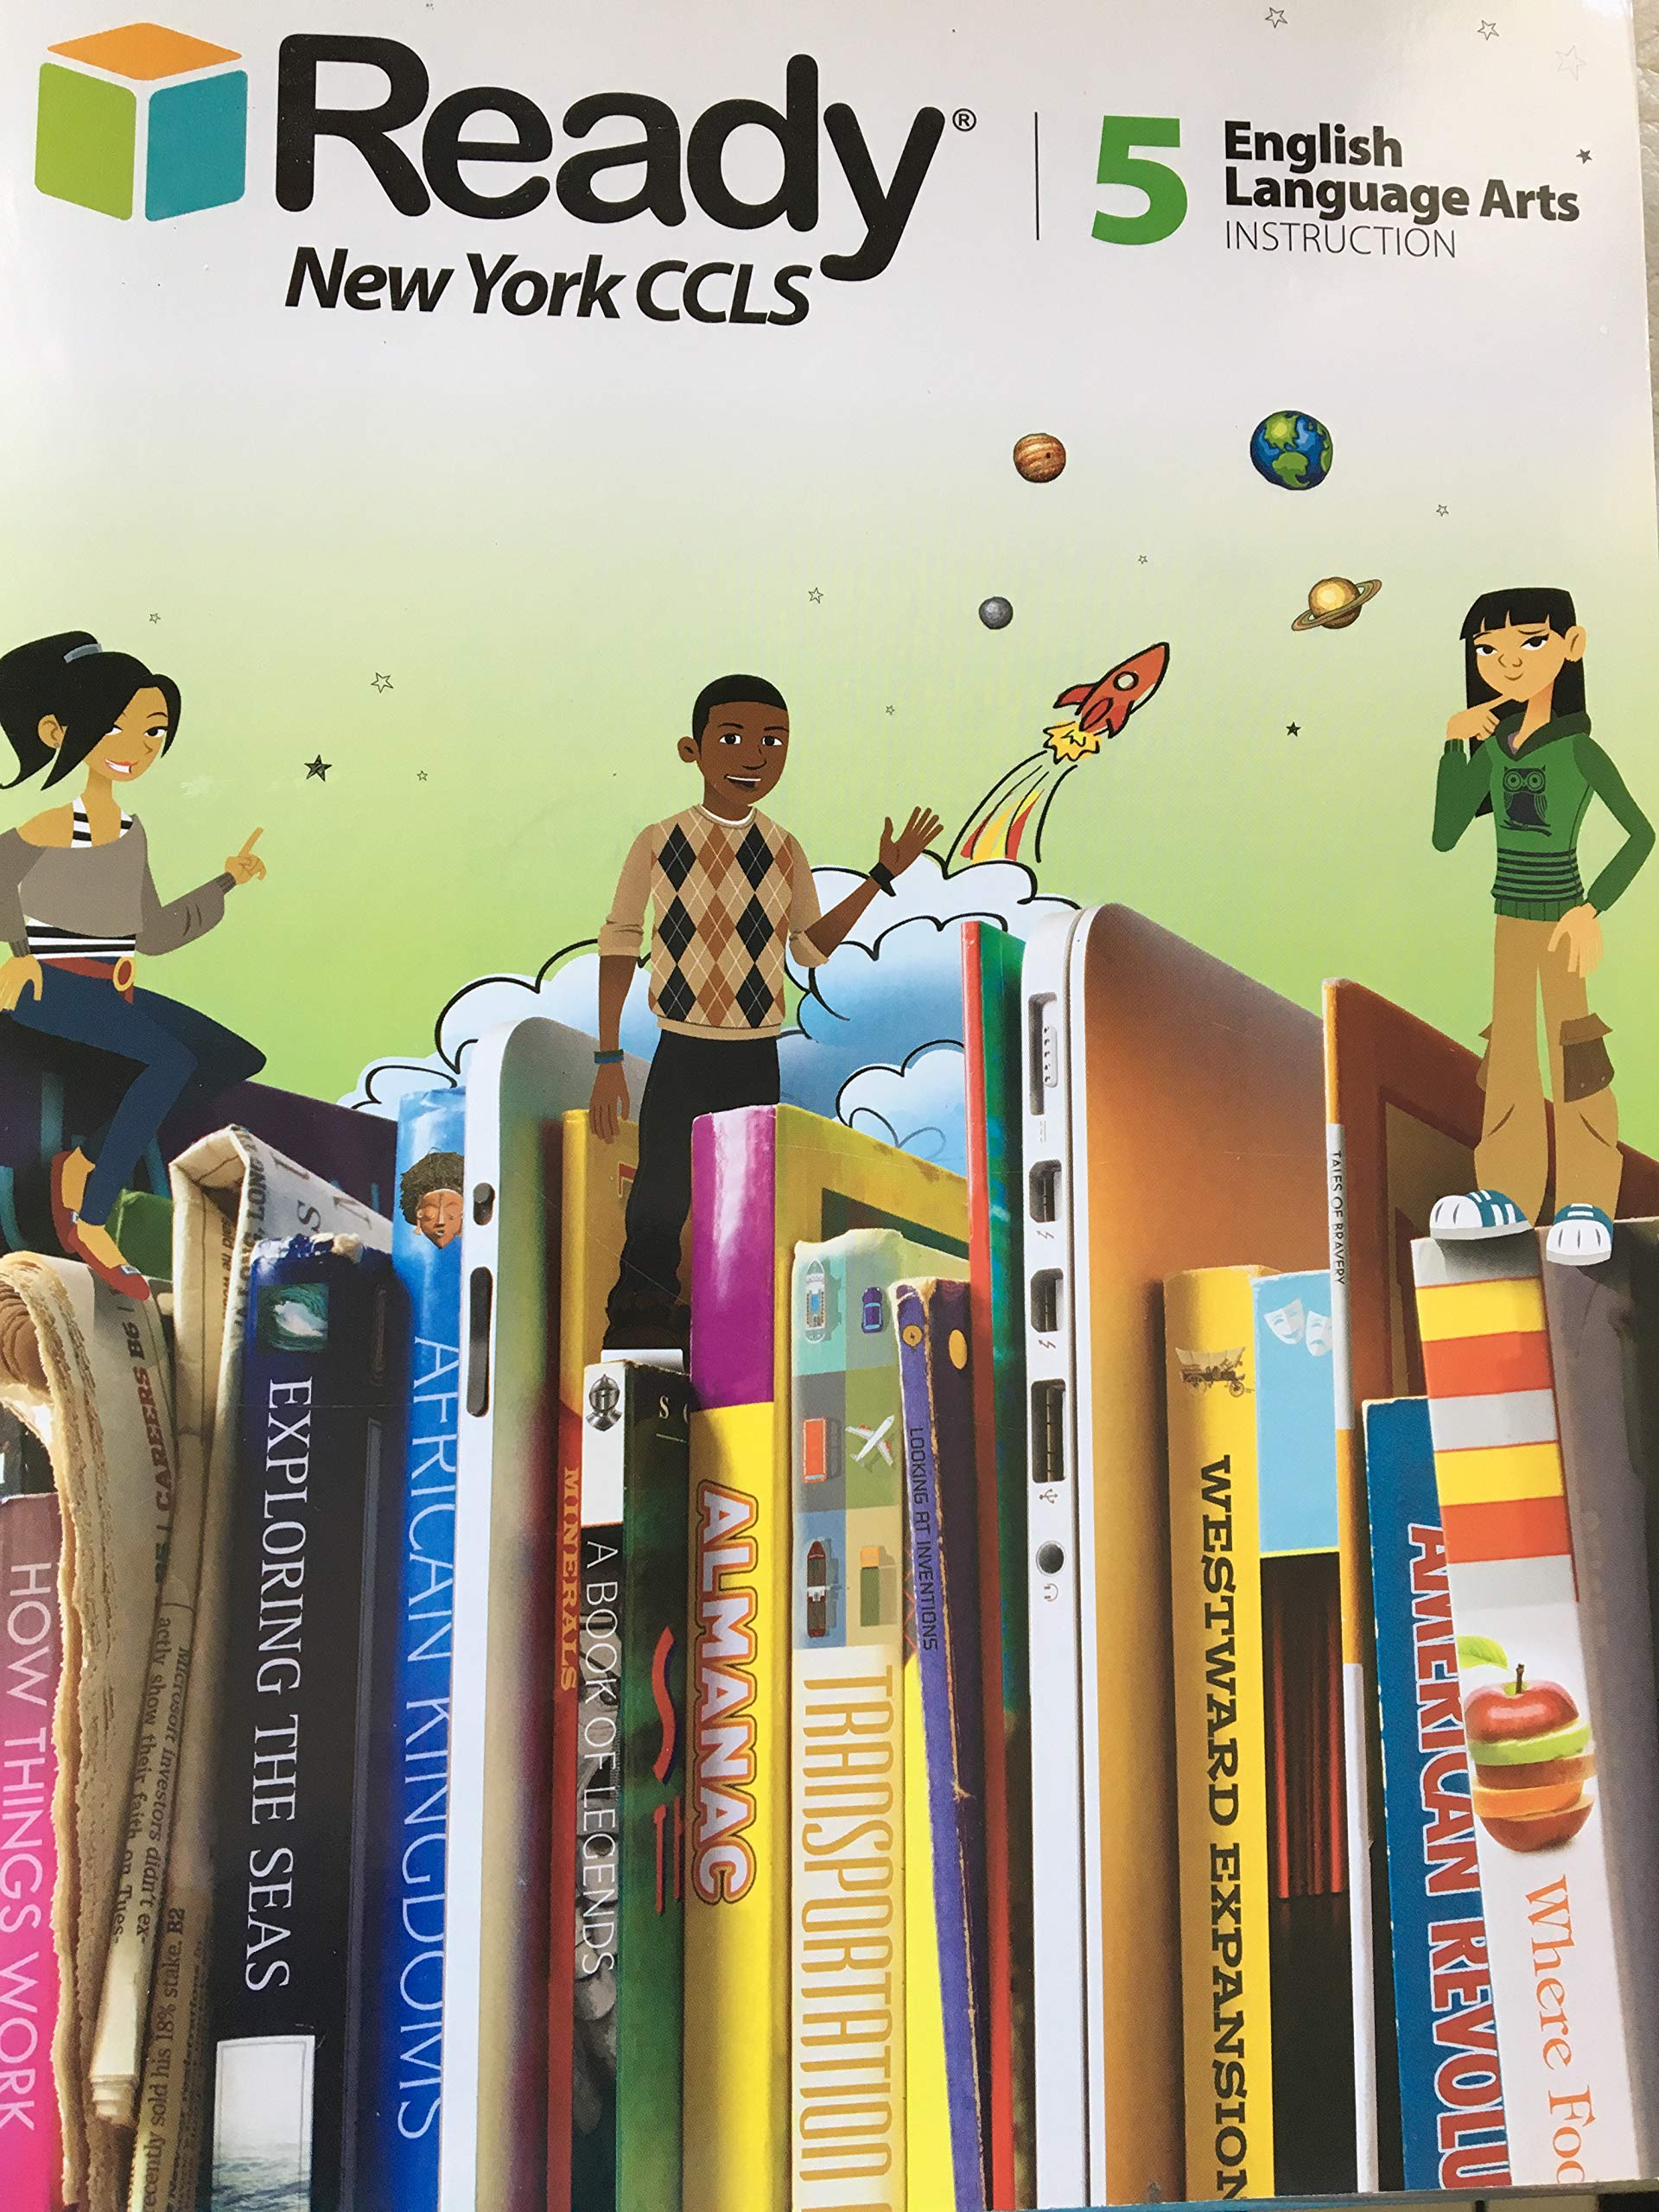 Ready New York Ccls 5 English Language Arts Instruction Curriculum Associates 9781495705687 Amazon Com Books